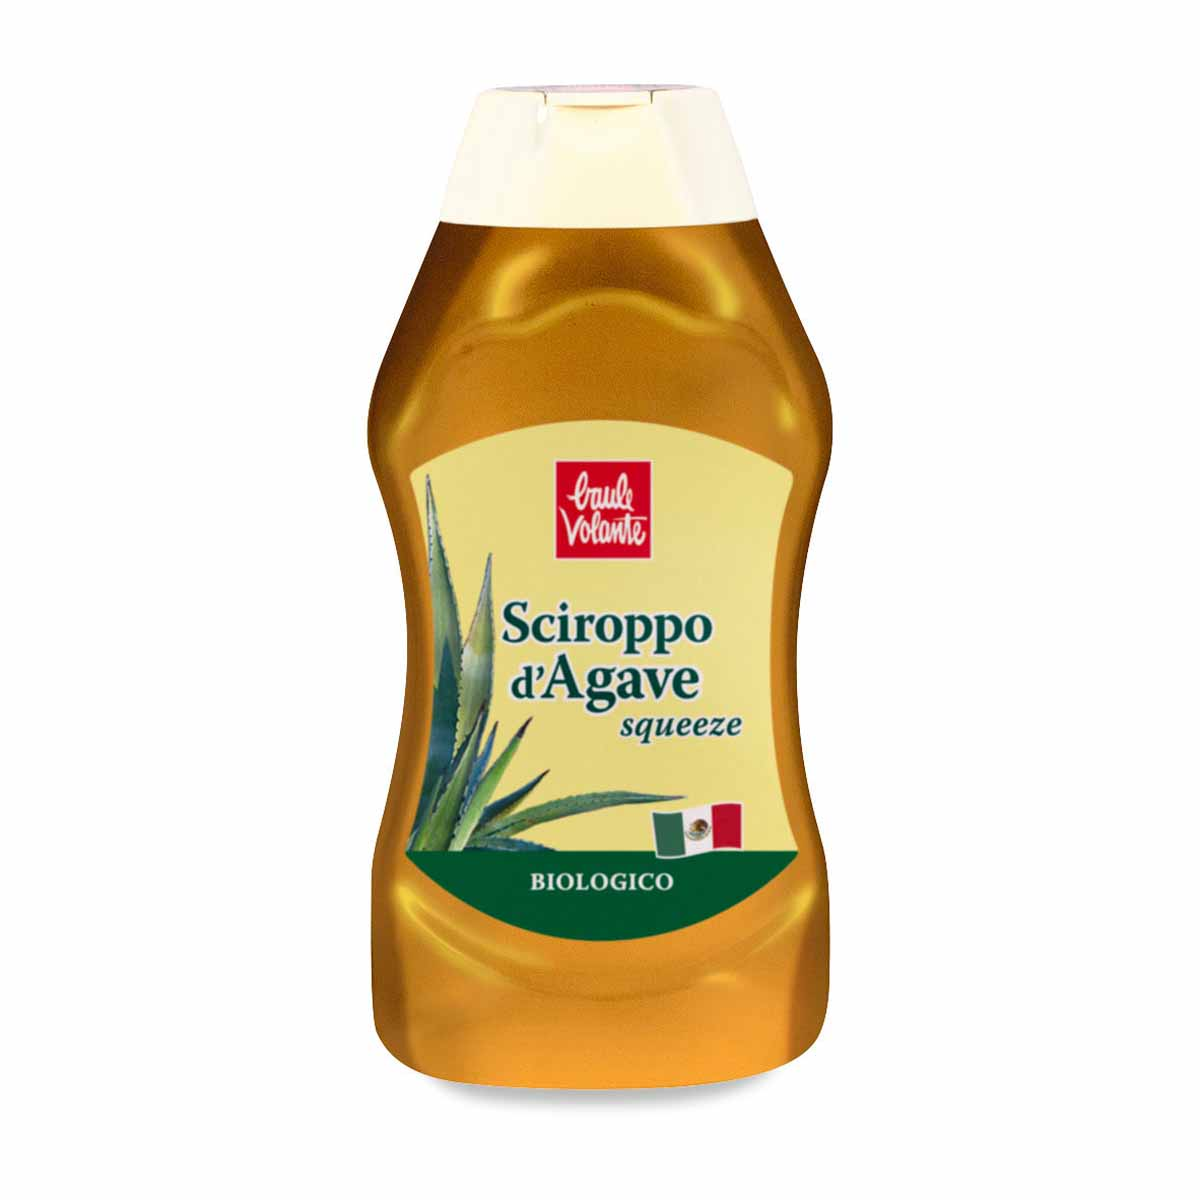 Baule Volante Sciroppo d'agave squeeze